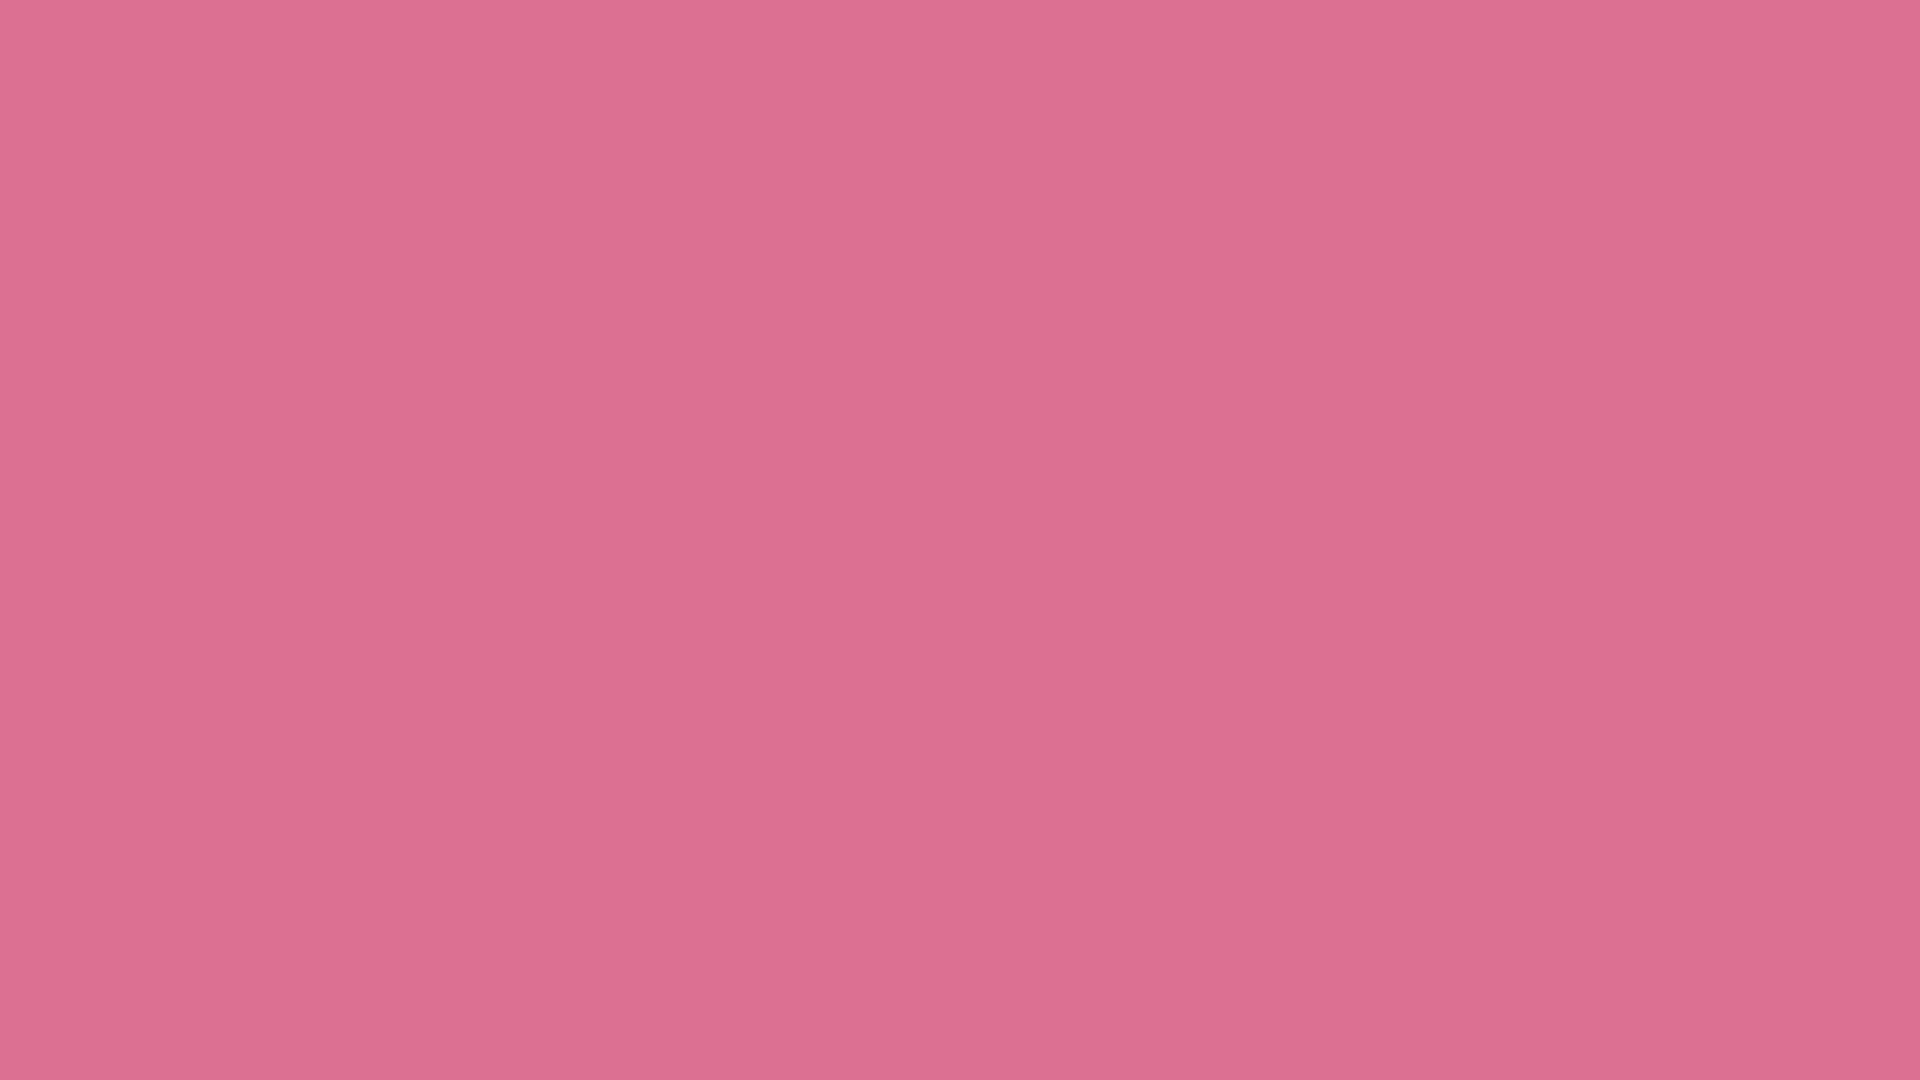 1920x1080 Pale Red-violet Solid Color Background